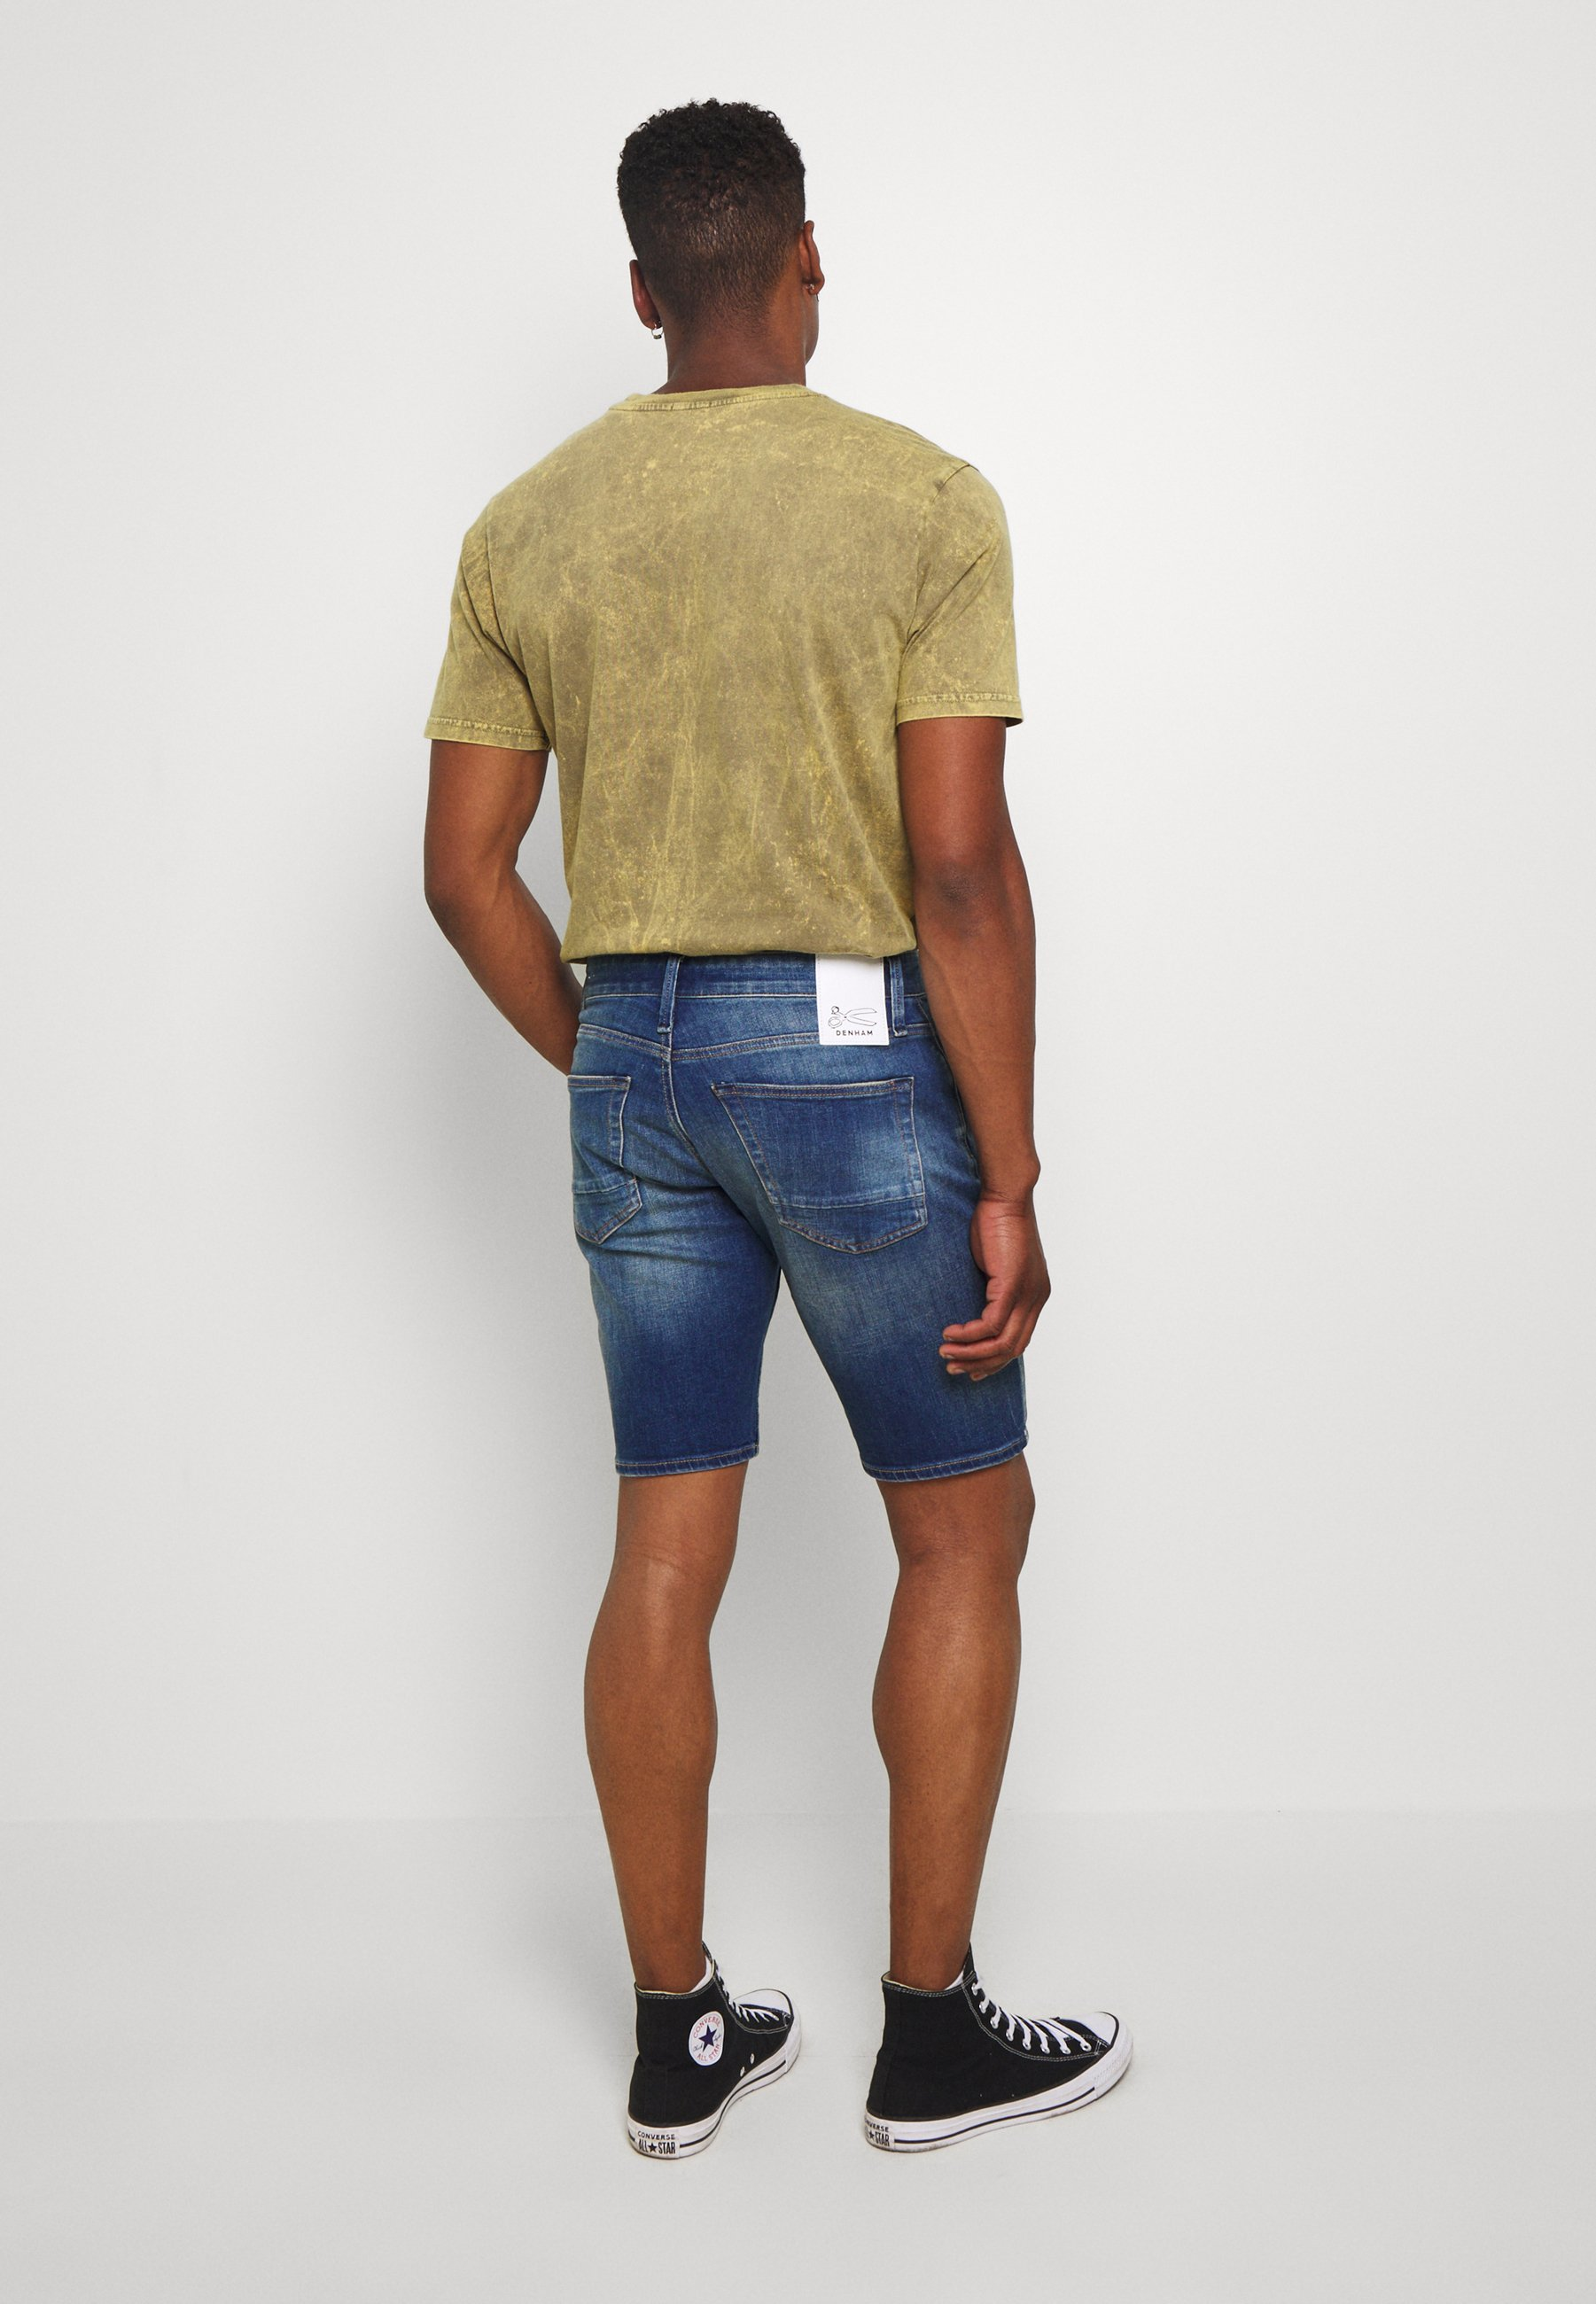 De Confianza Ropa de hombre Denham RAZOR Shorts vaqueros blue GKK4oS